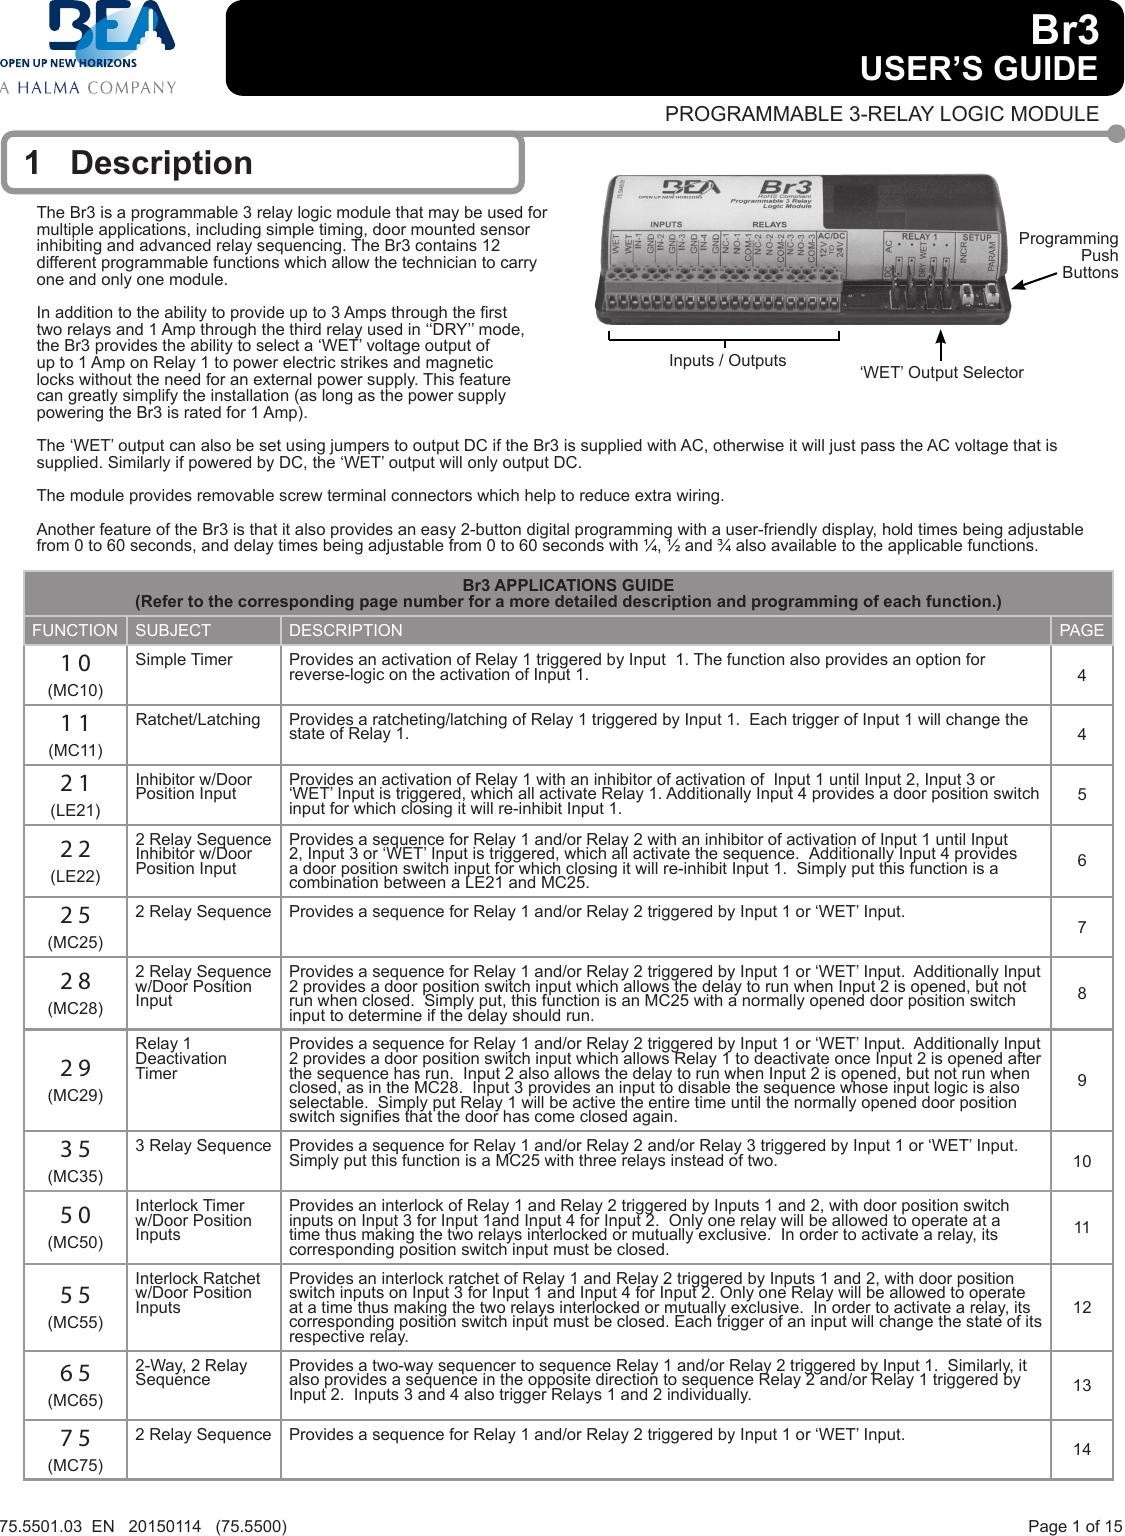 Bea 75550103en Br3 20150114 User Guide Logic Module Maglock Wiring Diagram